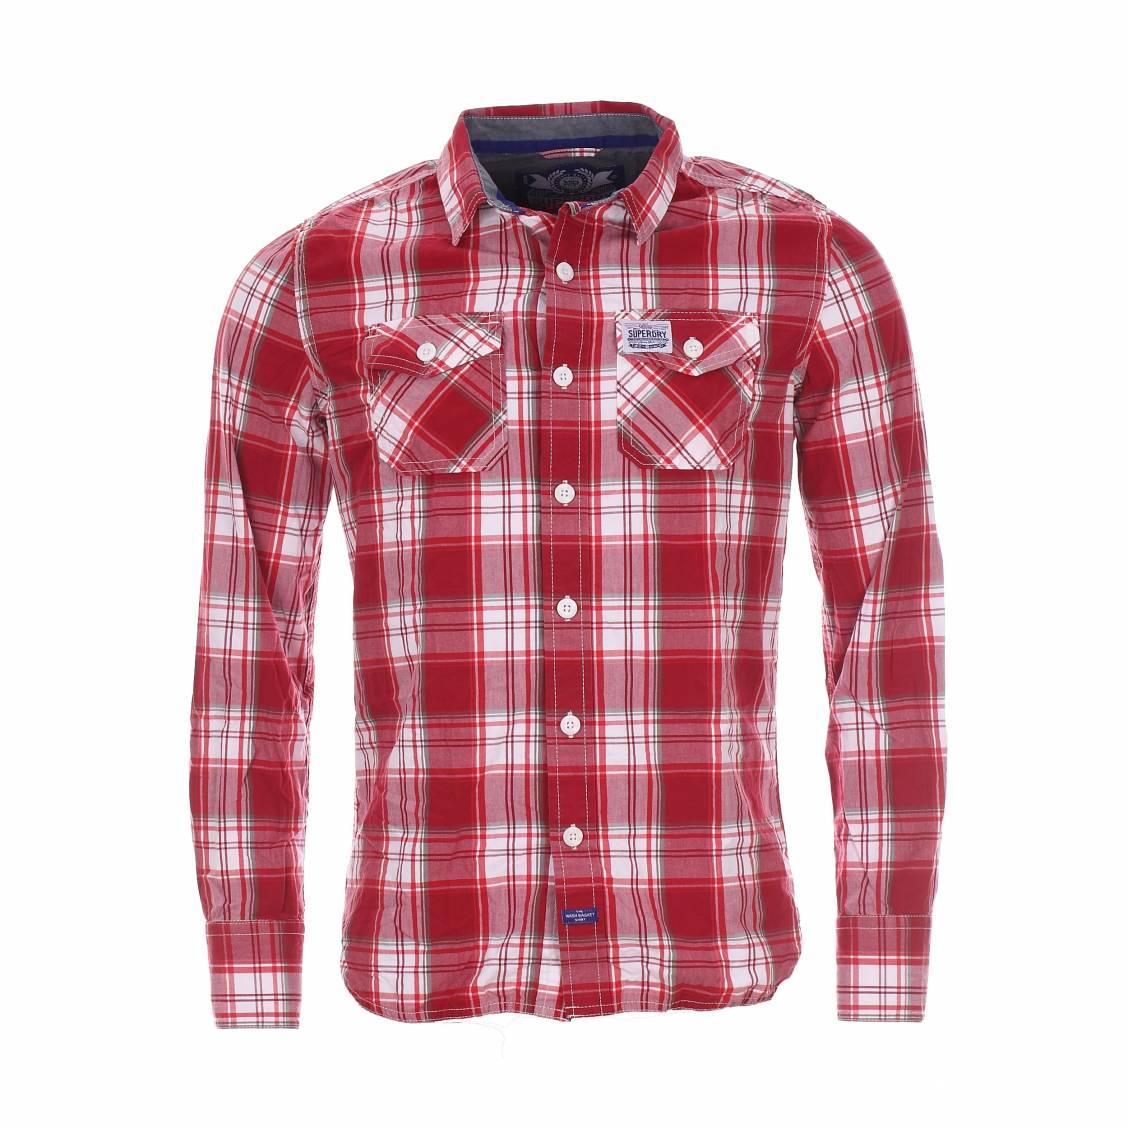 chemise cossaise superdry washbasket rouge brique blanche et grise rue des hommes. Black Bedroom Furniture Sets. Home Design Ideas